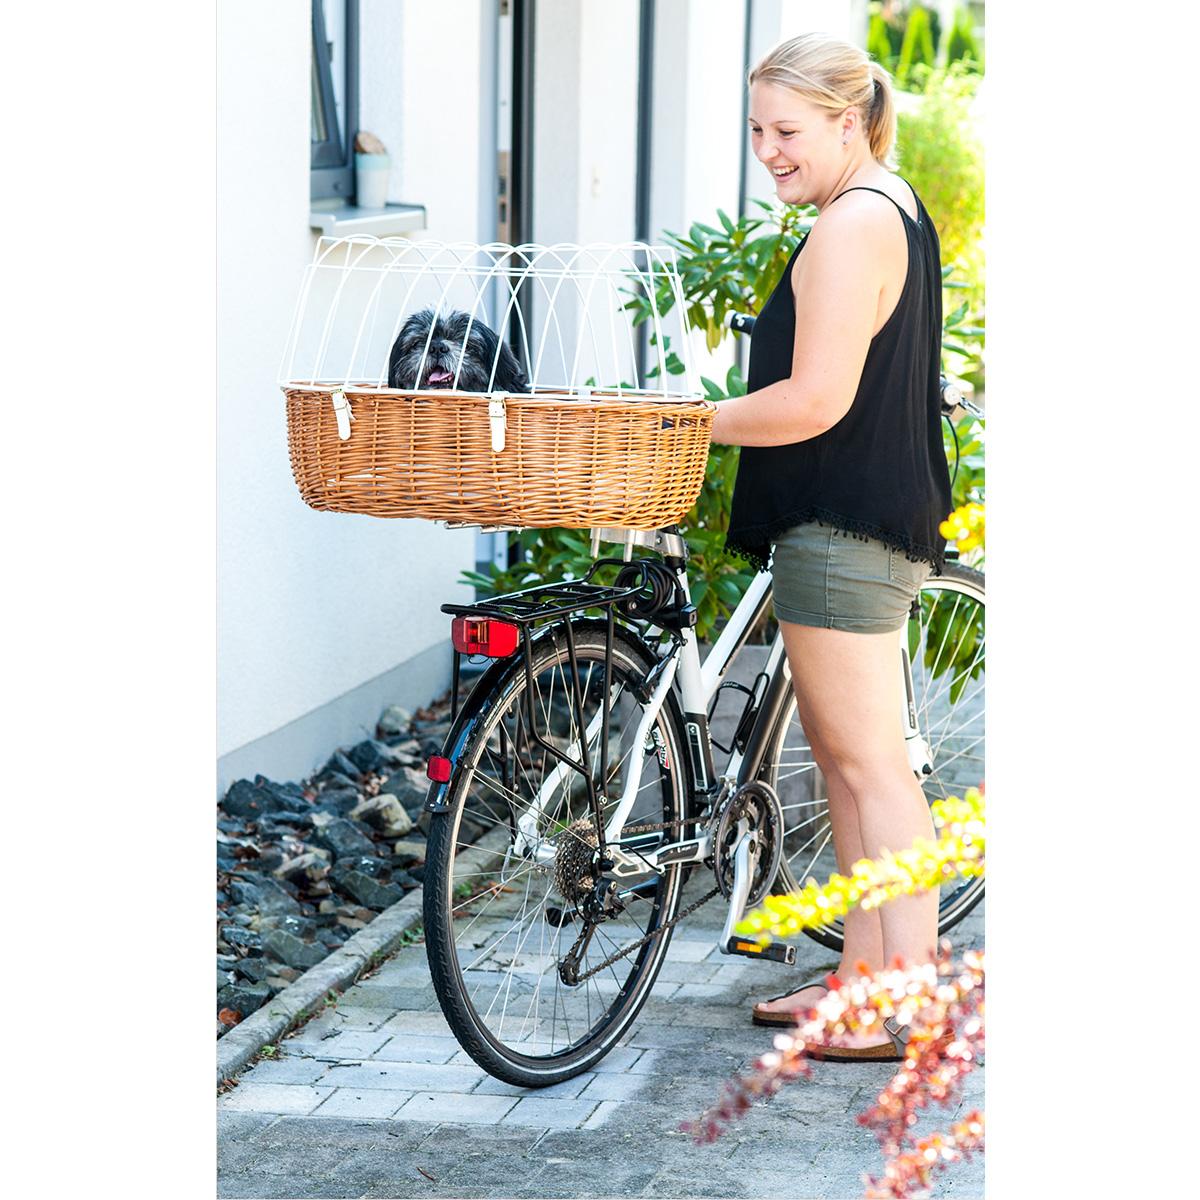 Aum ller fahrrad tierkorb weide standard f r rahmenmontage hundekorb fahrradkorb 4011599209237 - Fahrrad hundekorb ...